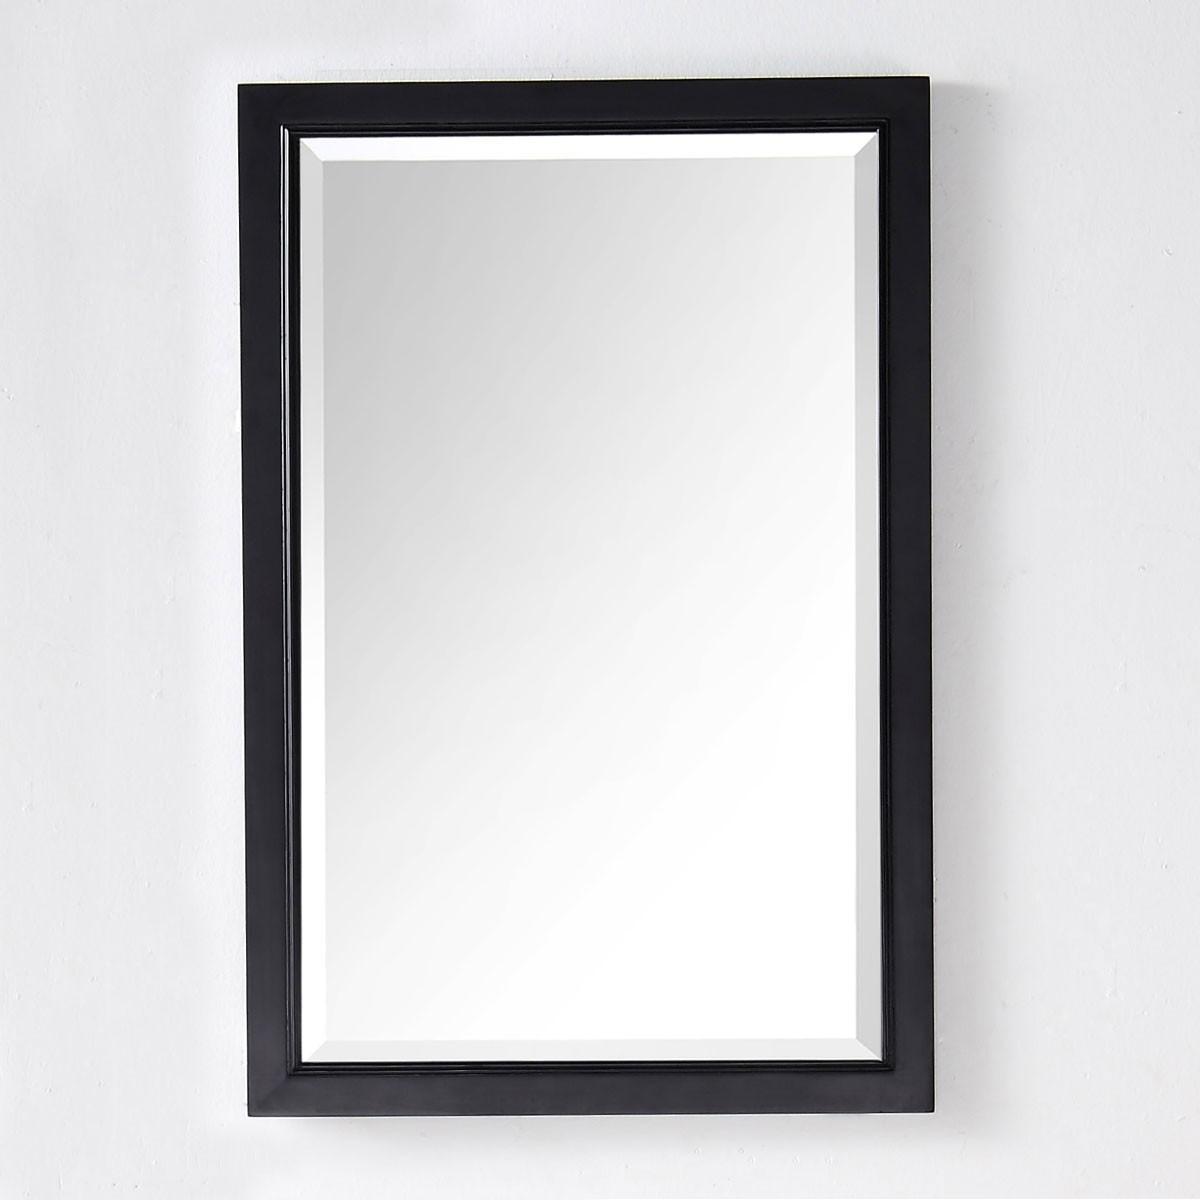 24 x 36 po Miroir avec Cadre Expresso (DK-6000-EM)